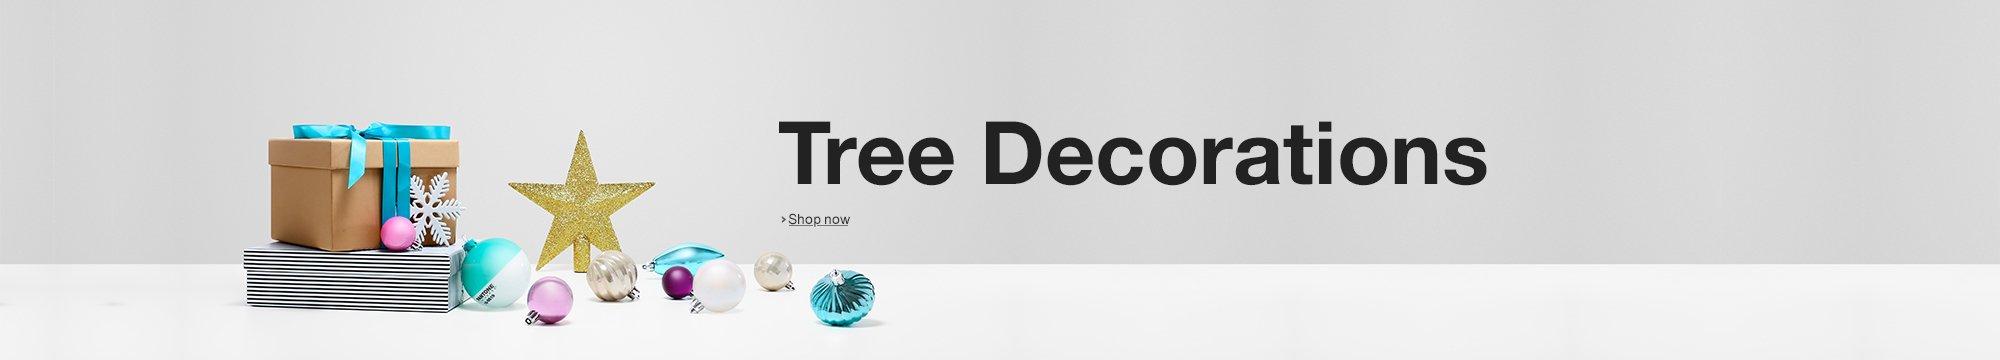 /Tree Decorations